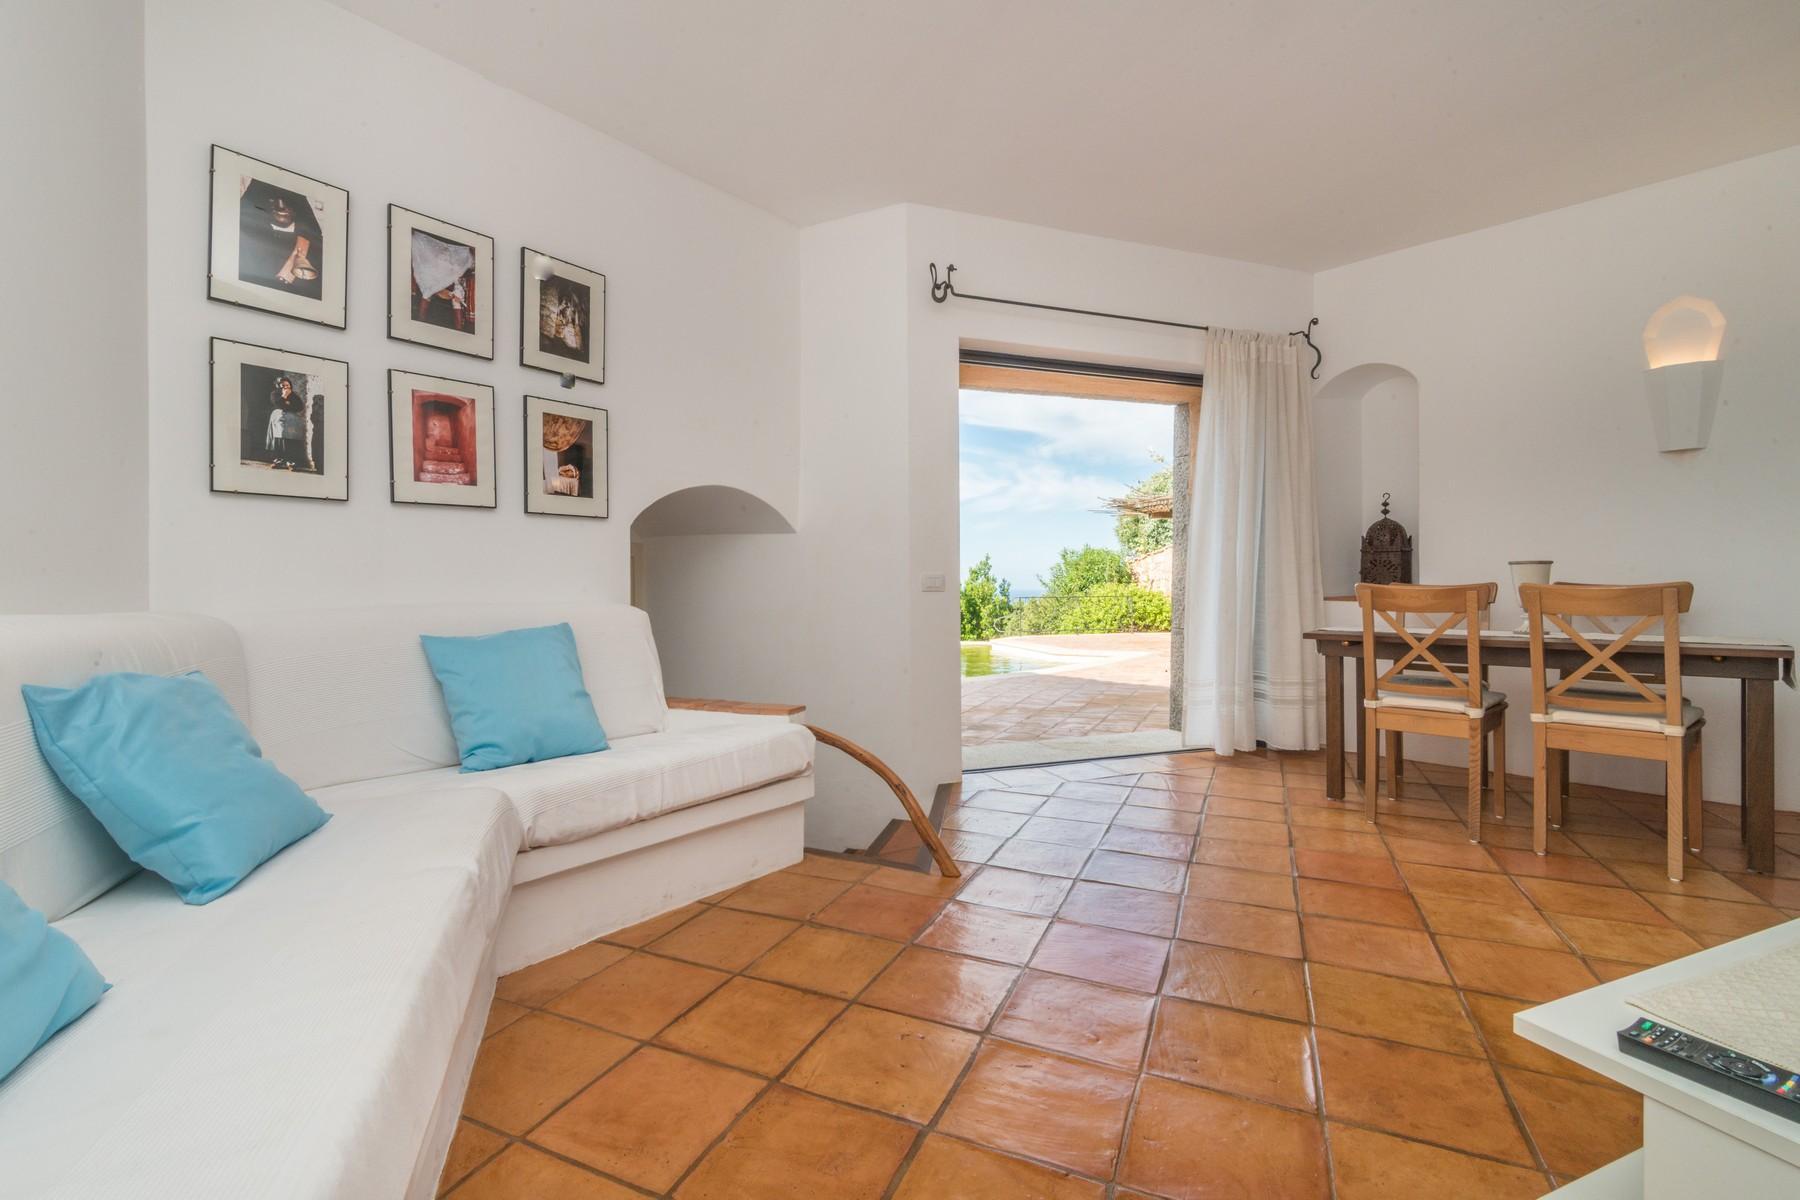 Porto Cervo Abbiadori Splendide villa jumelée avec vue sur le golfe de Pevero - 14